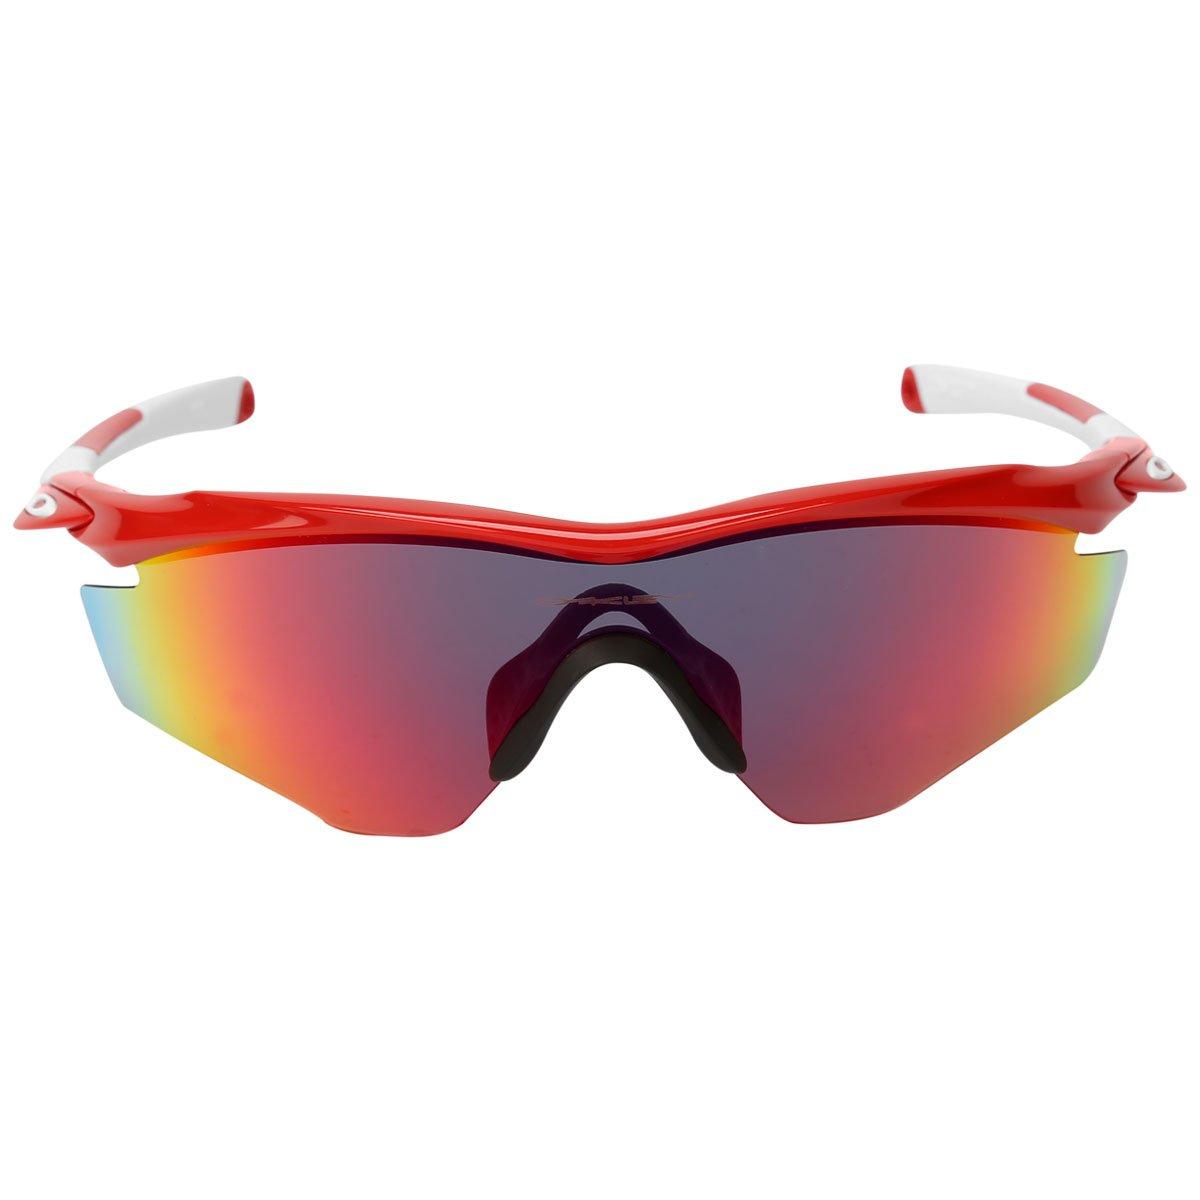 5eb2d820d15c8 Óculos Oakley M2 Frame - Iridium - Compre Agora   Netshoes